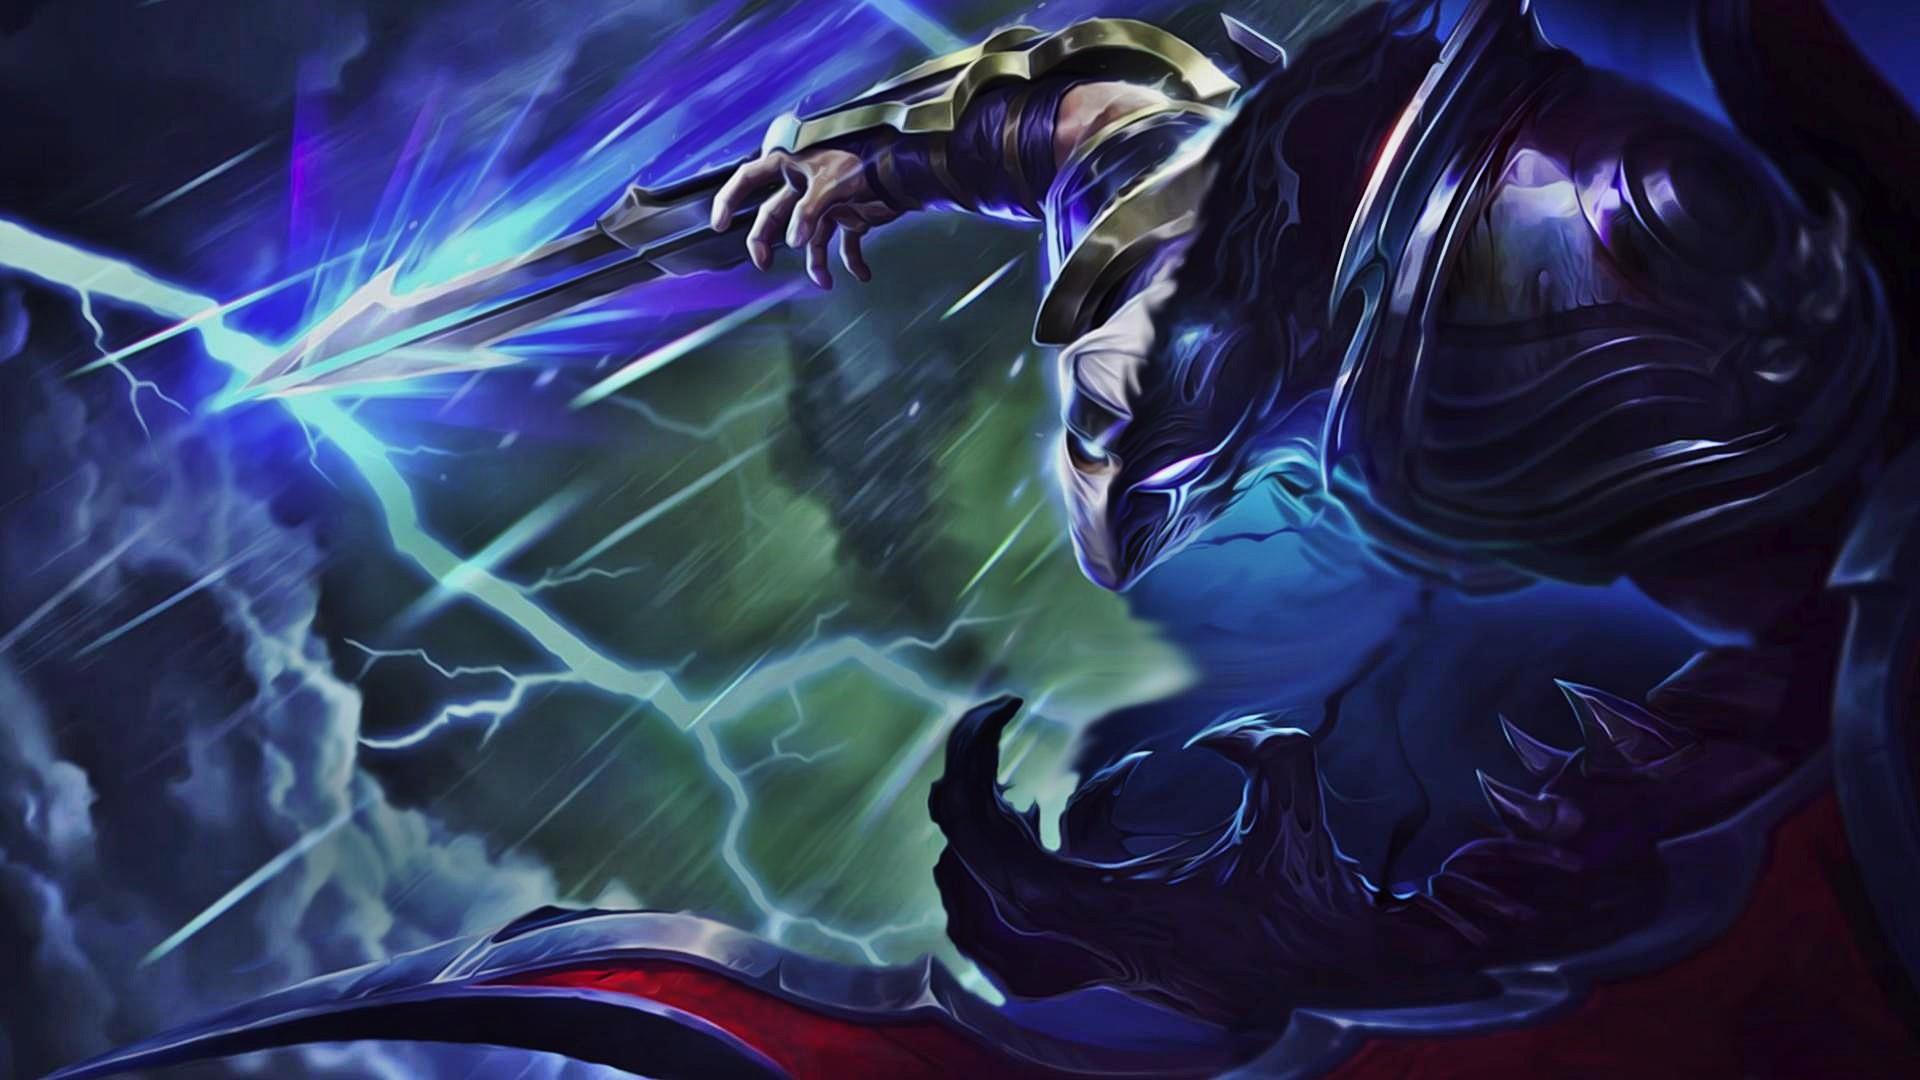 Bloodfury Renekton Skin – Plan On Getting (When I Buy Him)   League of  Legends   Pinterest